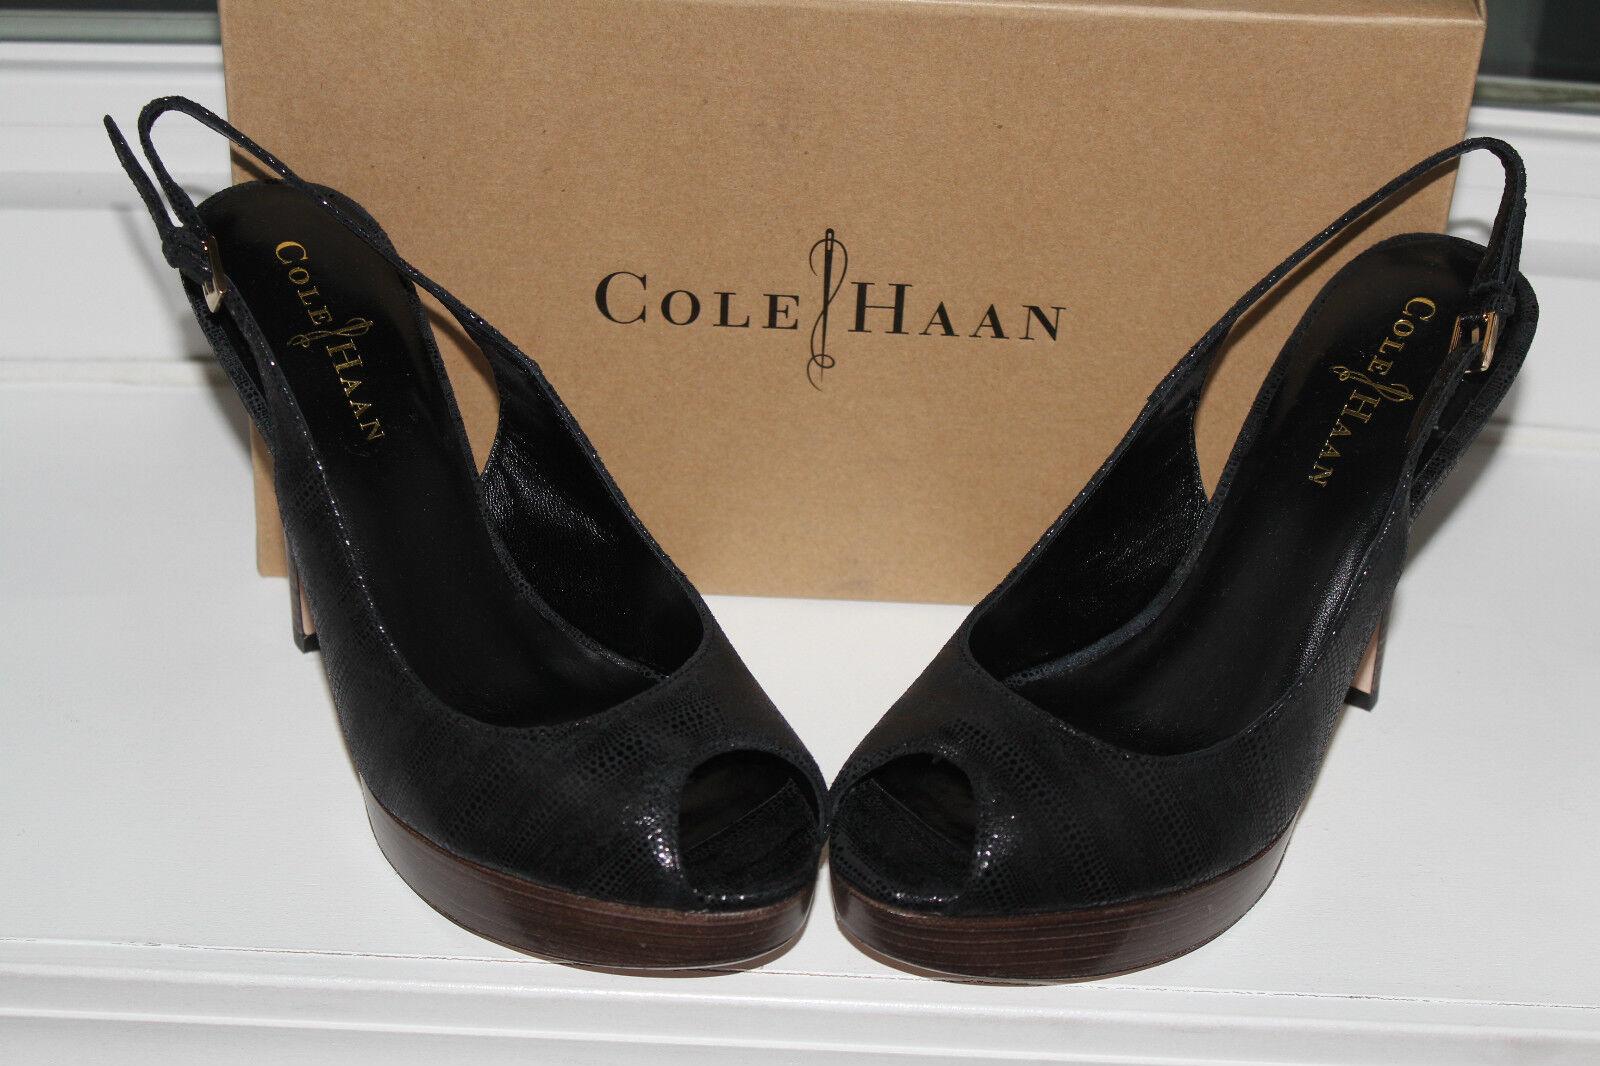 COLE HAAN MARIELA AIR OT SLING noir noir noir EXOTIC PRINT  9us  327 99f815